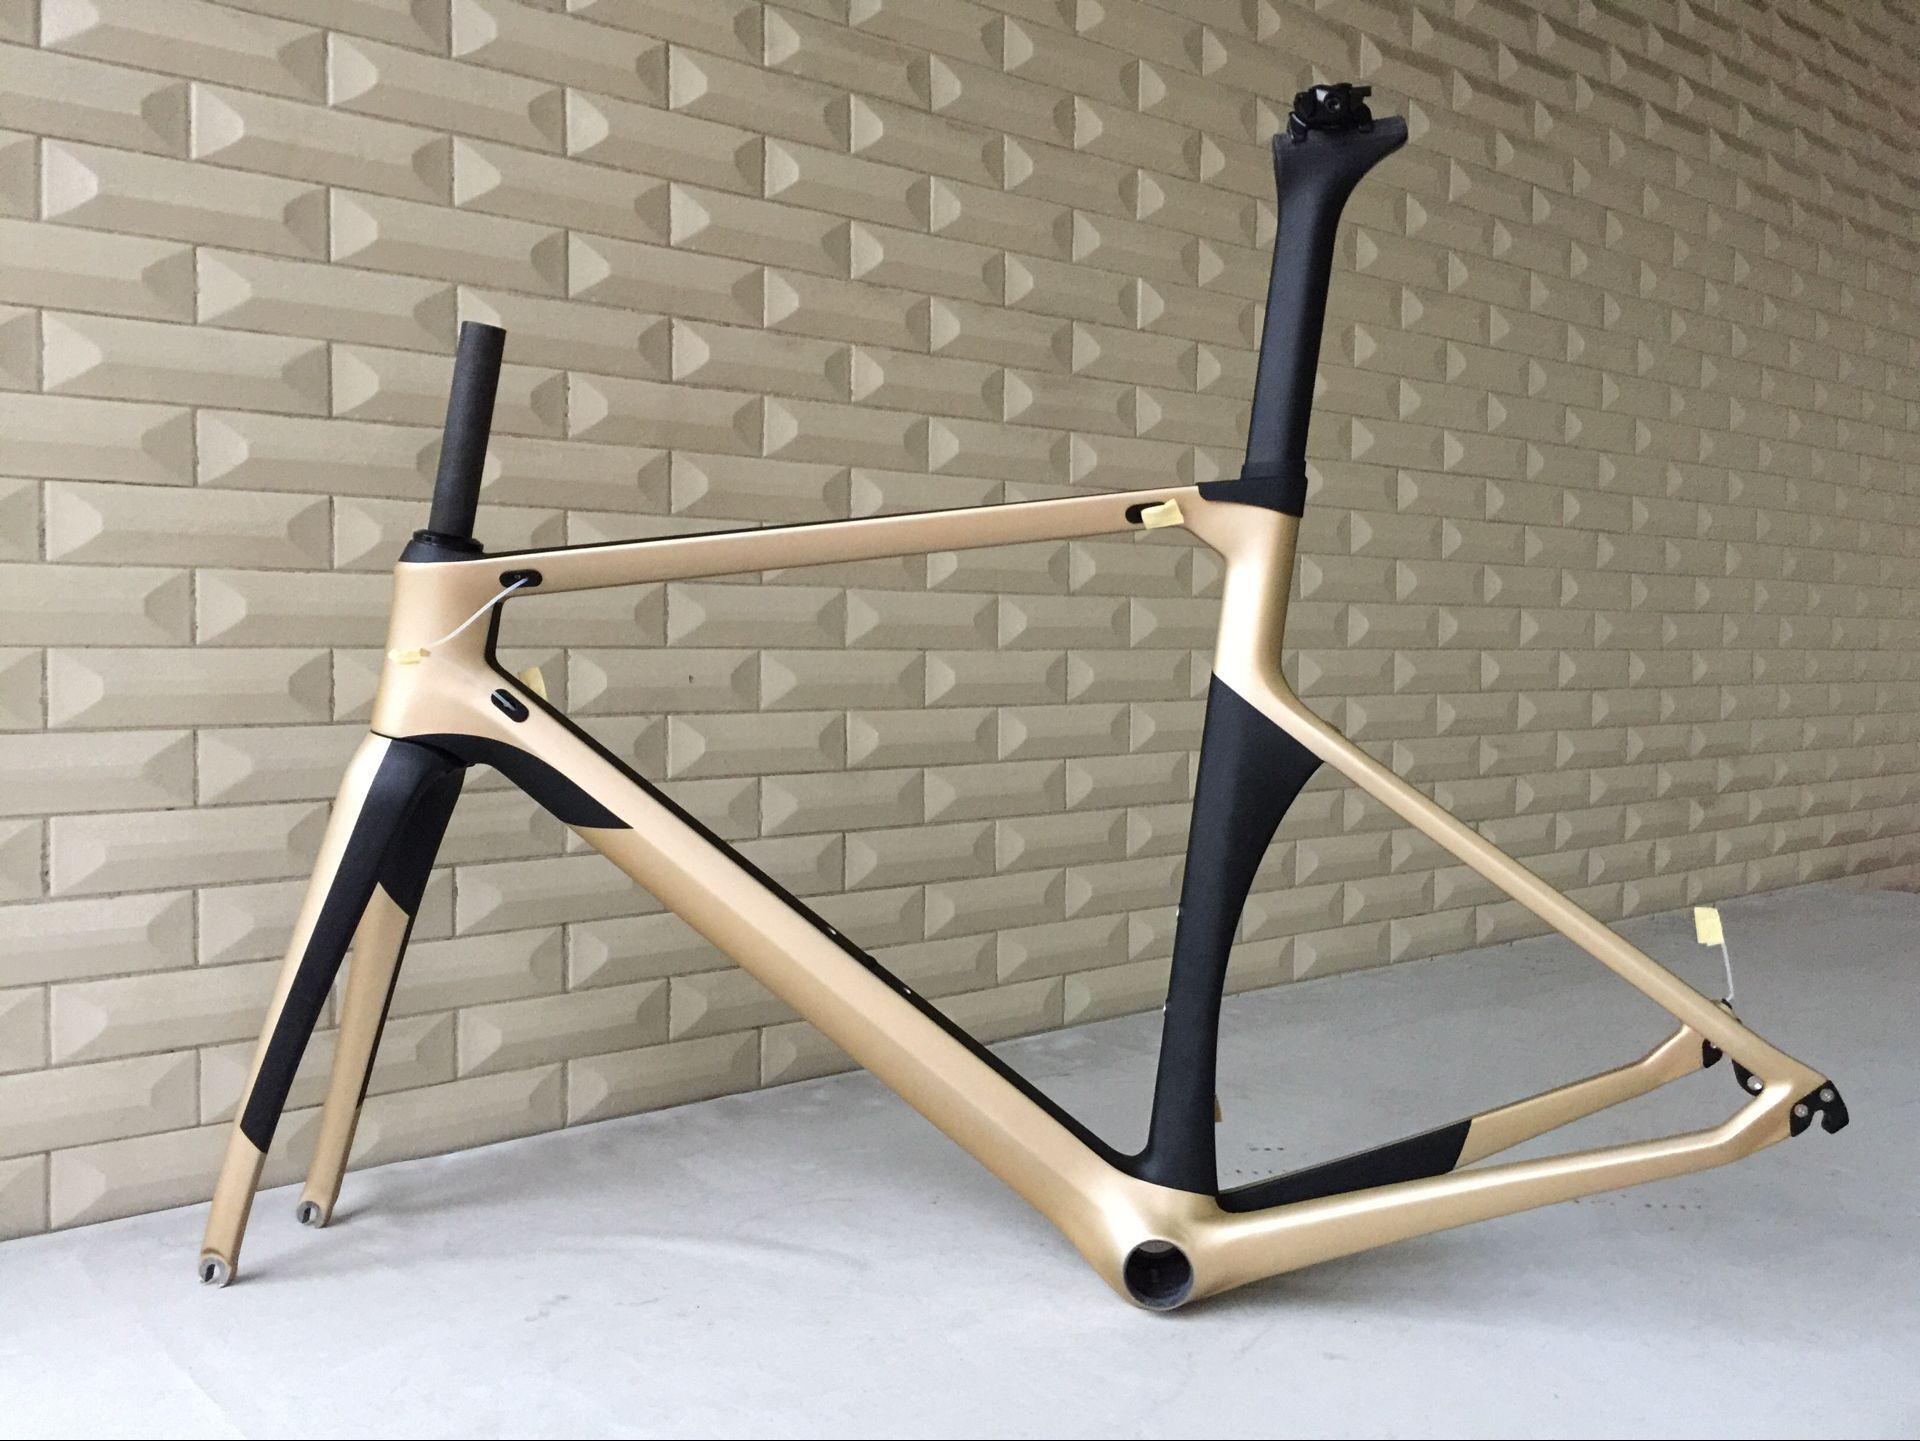 gro handel chinesische di2 carbon rennrad rahmen bb86 aero. Black Bedroom Furniture Sets. Home Design Ideas